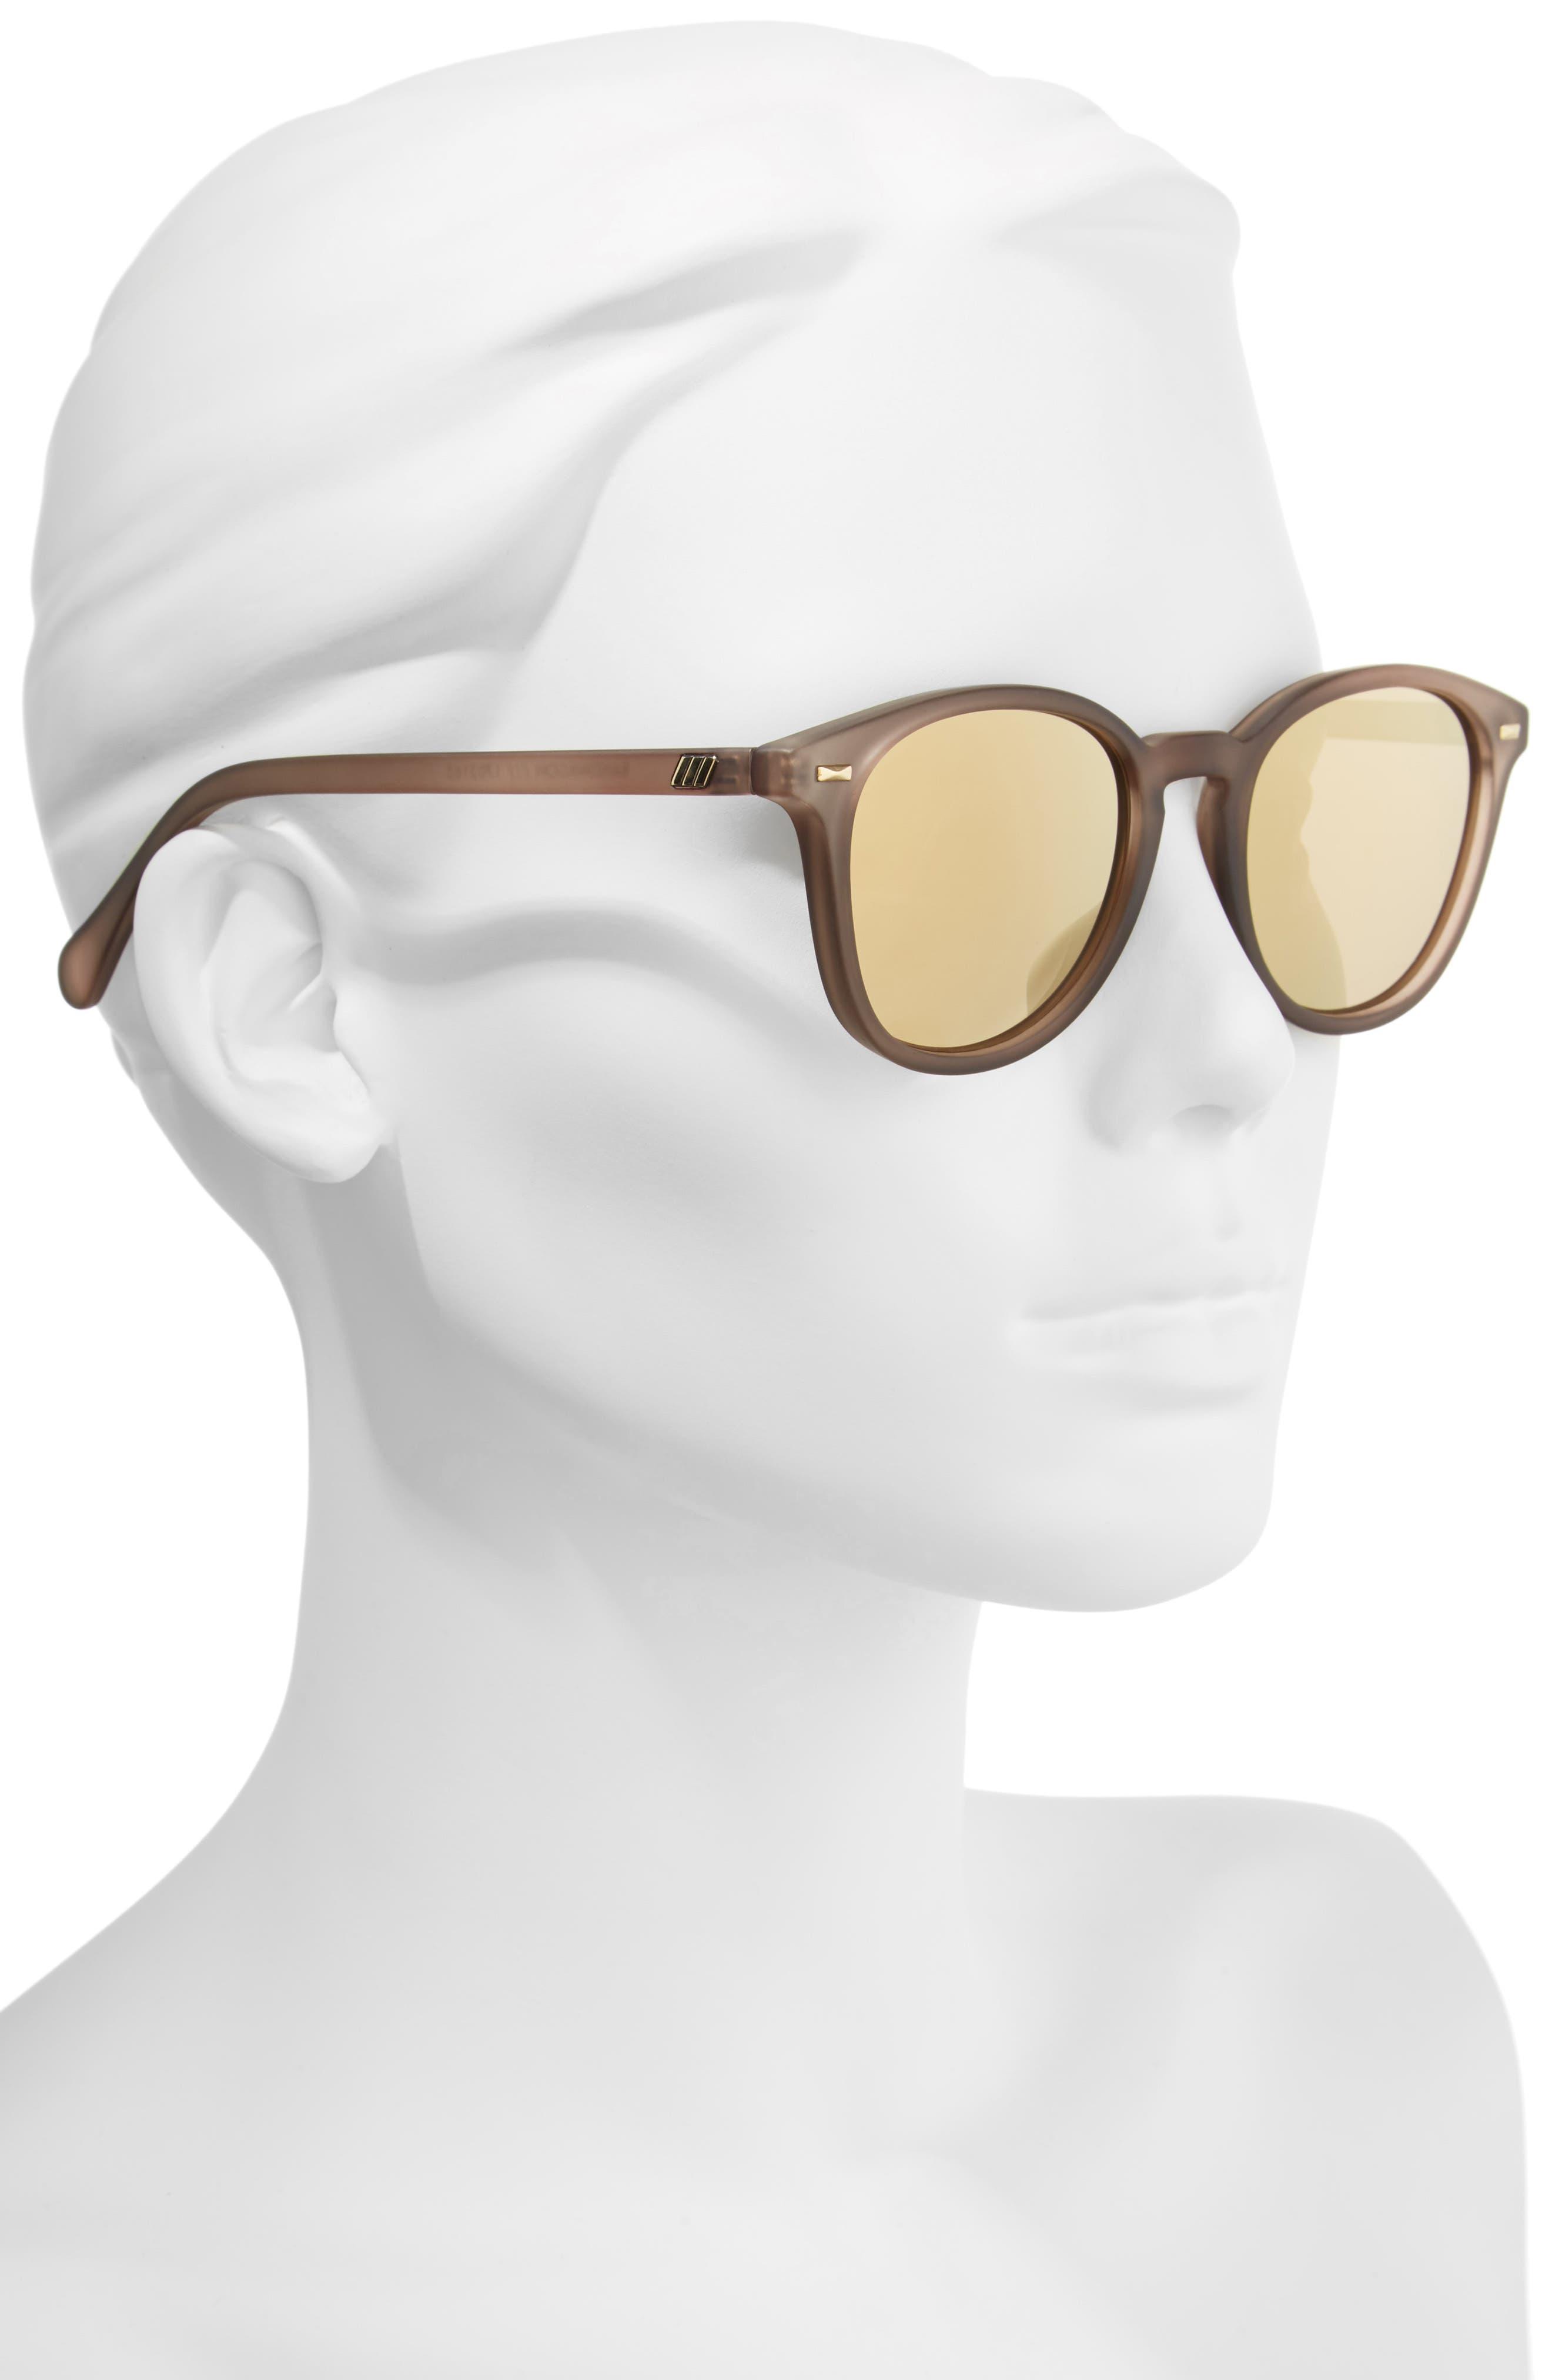 Alternate Image 3  - Le Specs x Lumira Bandwagon 51mm Sunglasses & Candle Gift Set